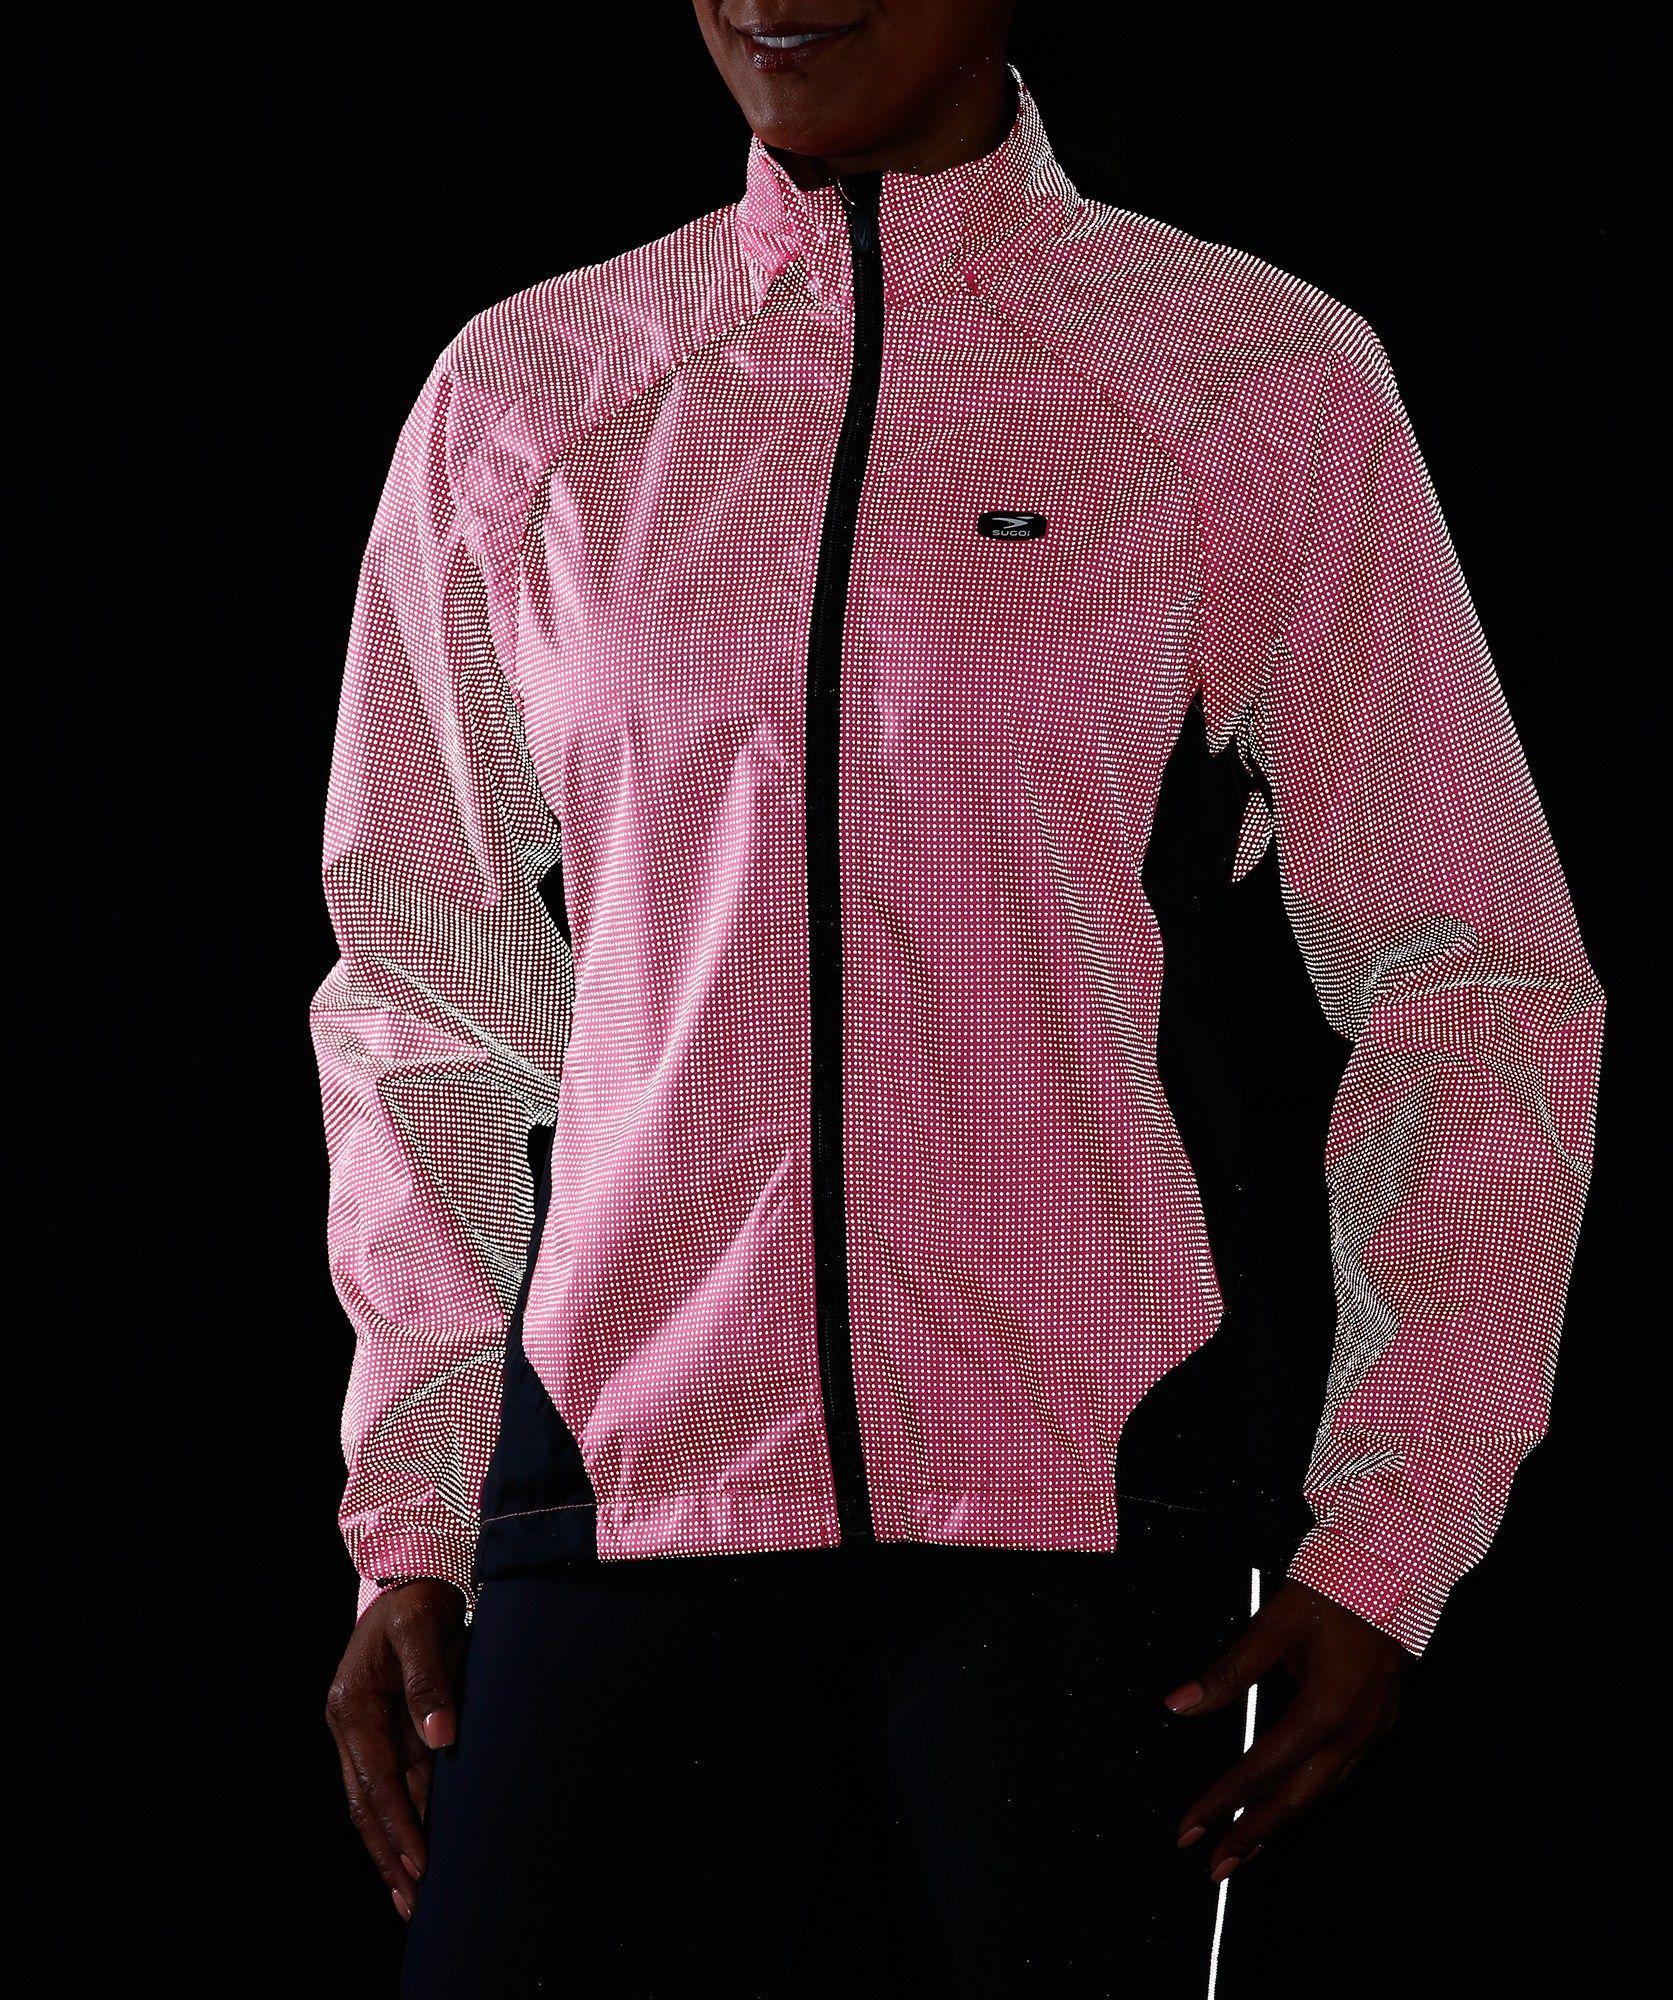 Sugoi Womens Zap Versa Cycling Jacket Cycle Coat Top Running Jackets